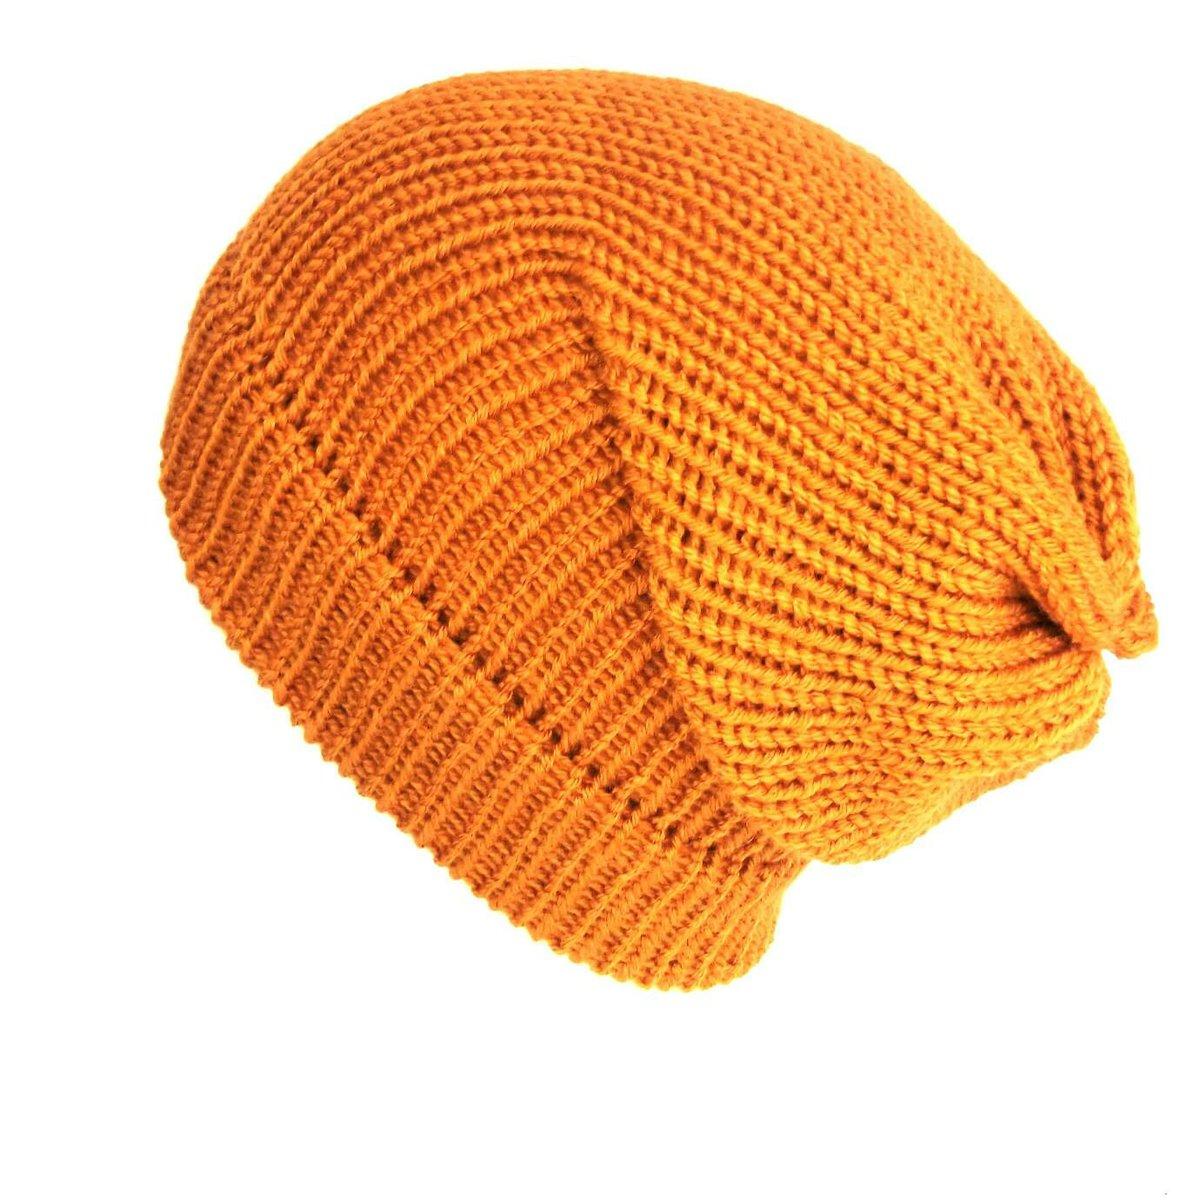 fbd2ad30ad6 ... beanie wool beanie hats women hipster chemo hat best friend gift mens  hat knit hats https   etsy.me 2sjc43C  EtsyUK  Womaninbiz  Etsyfashion   Etsyshop ...